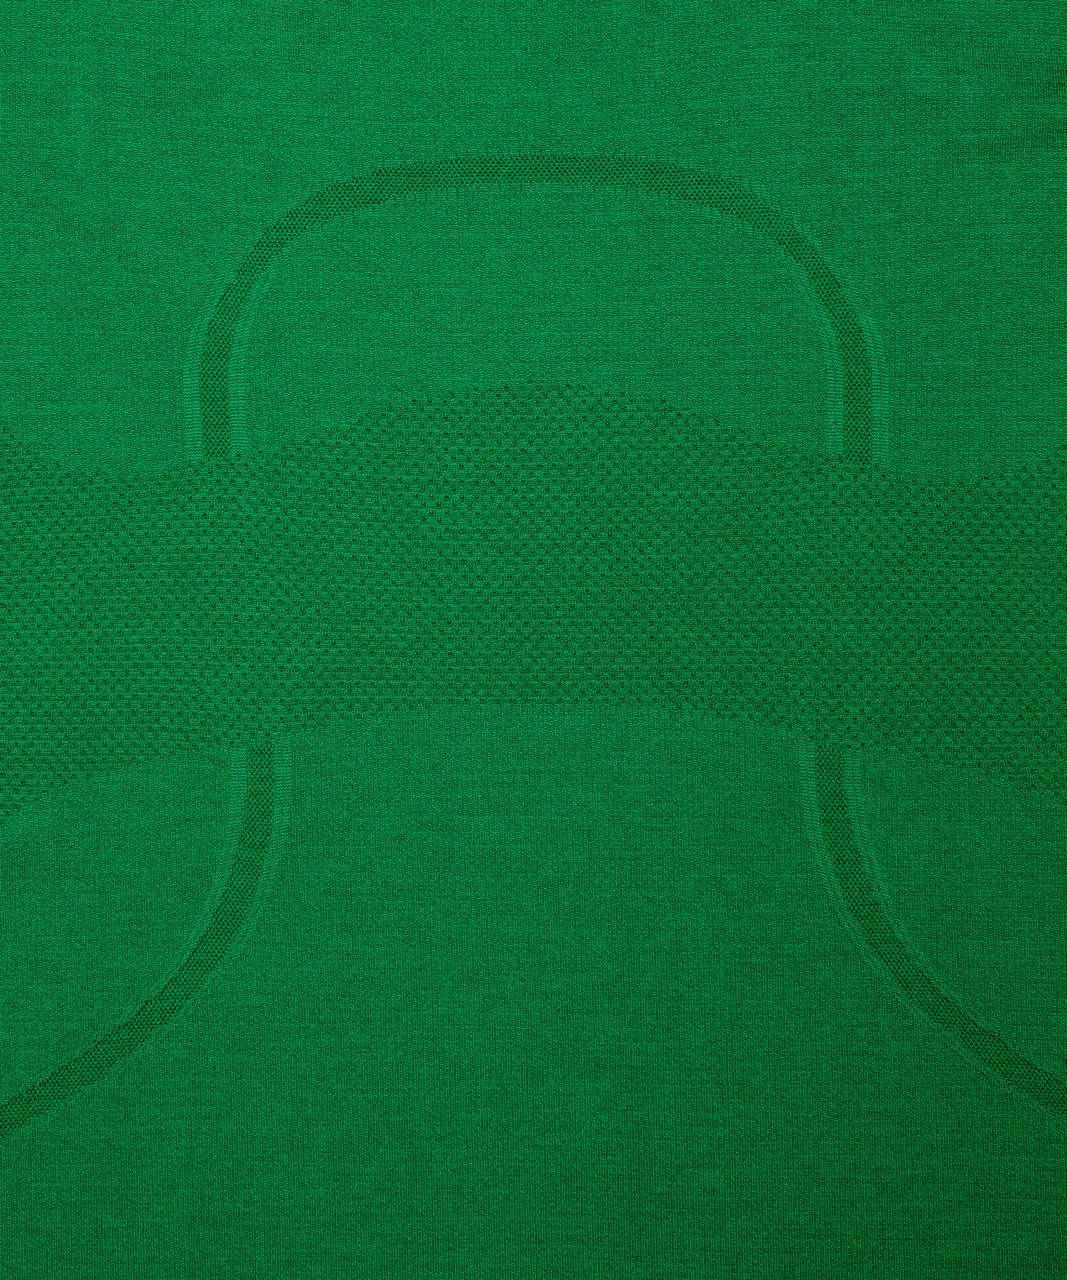 Lululemon Swiftly Tech Racerback - Classic Green / Classic Green